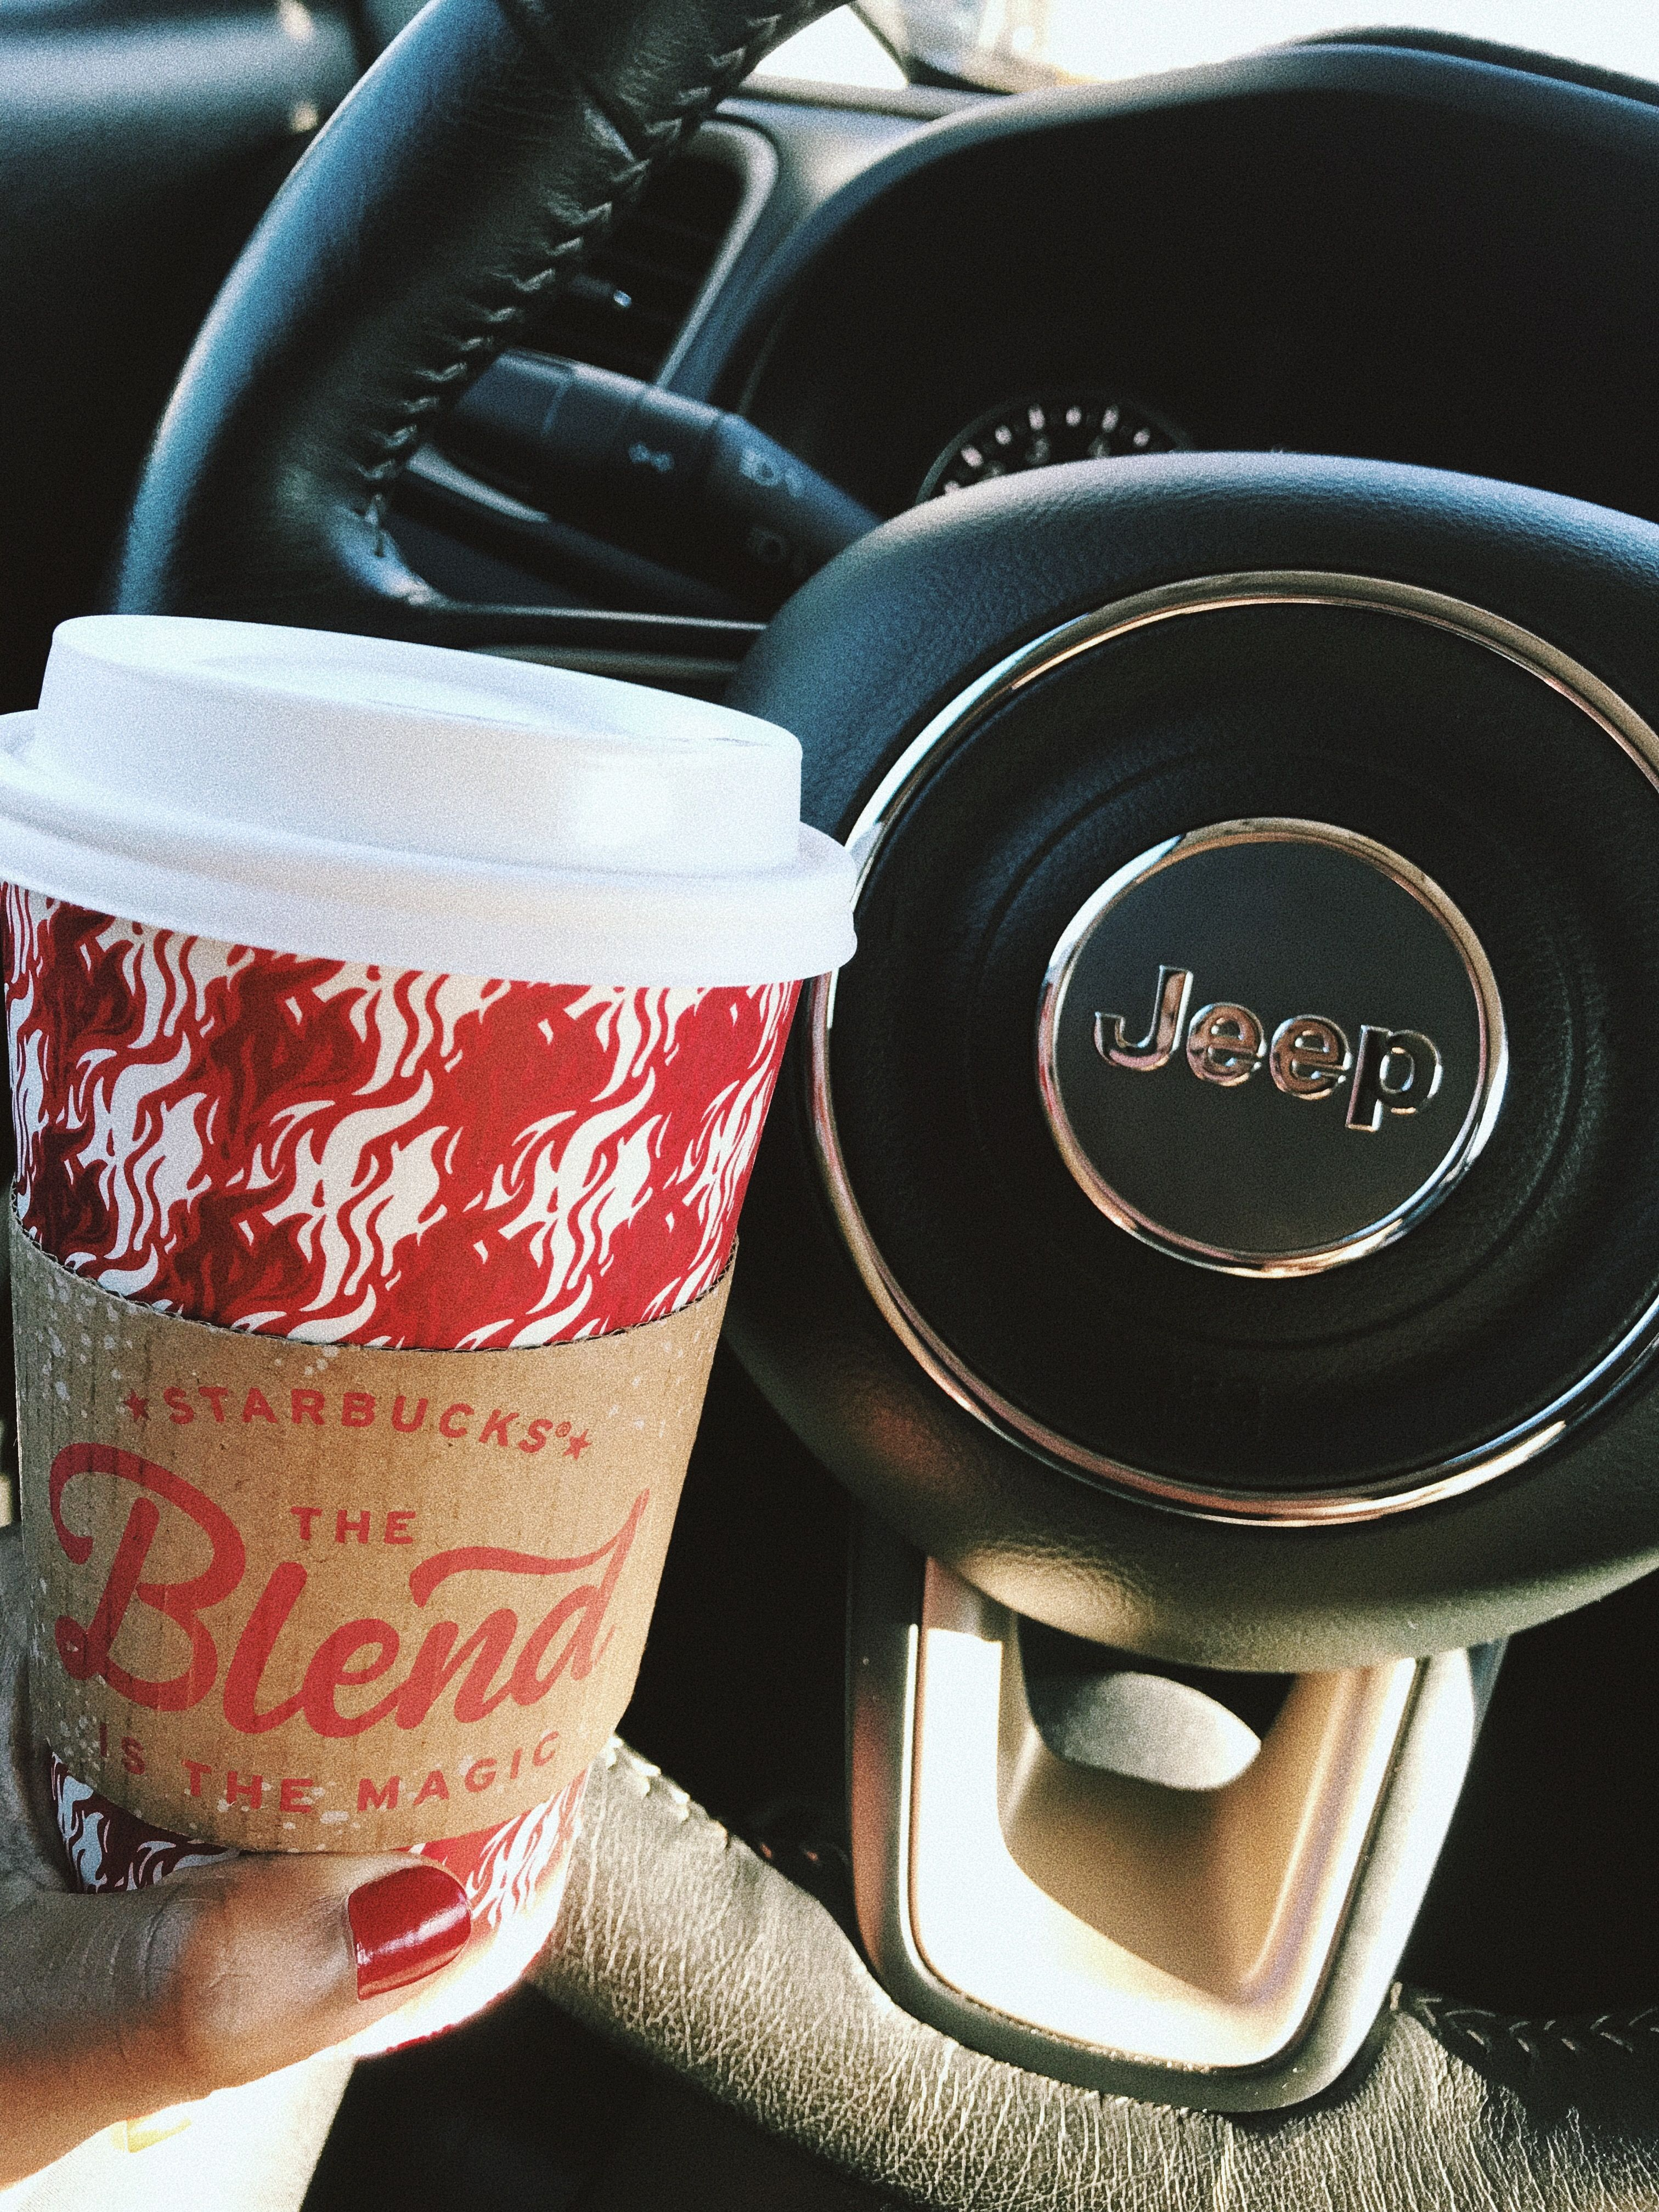 jeep coffee starbucks Dunkin donuts coffee cup